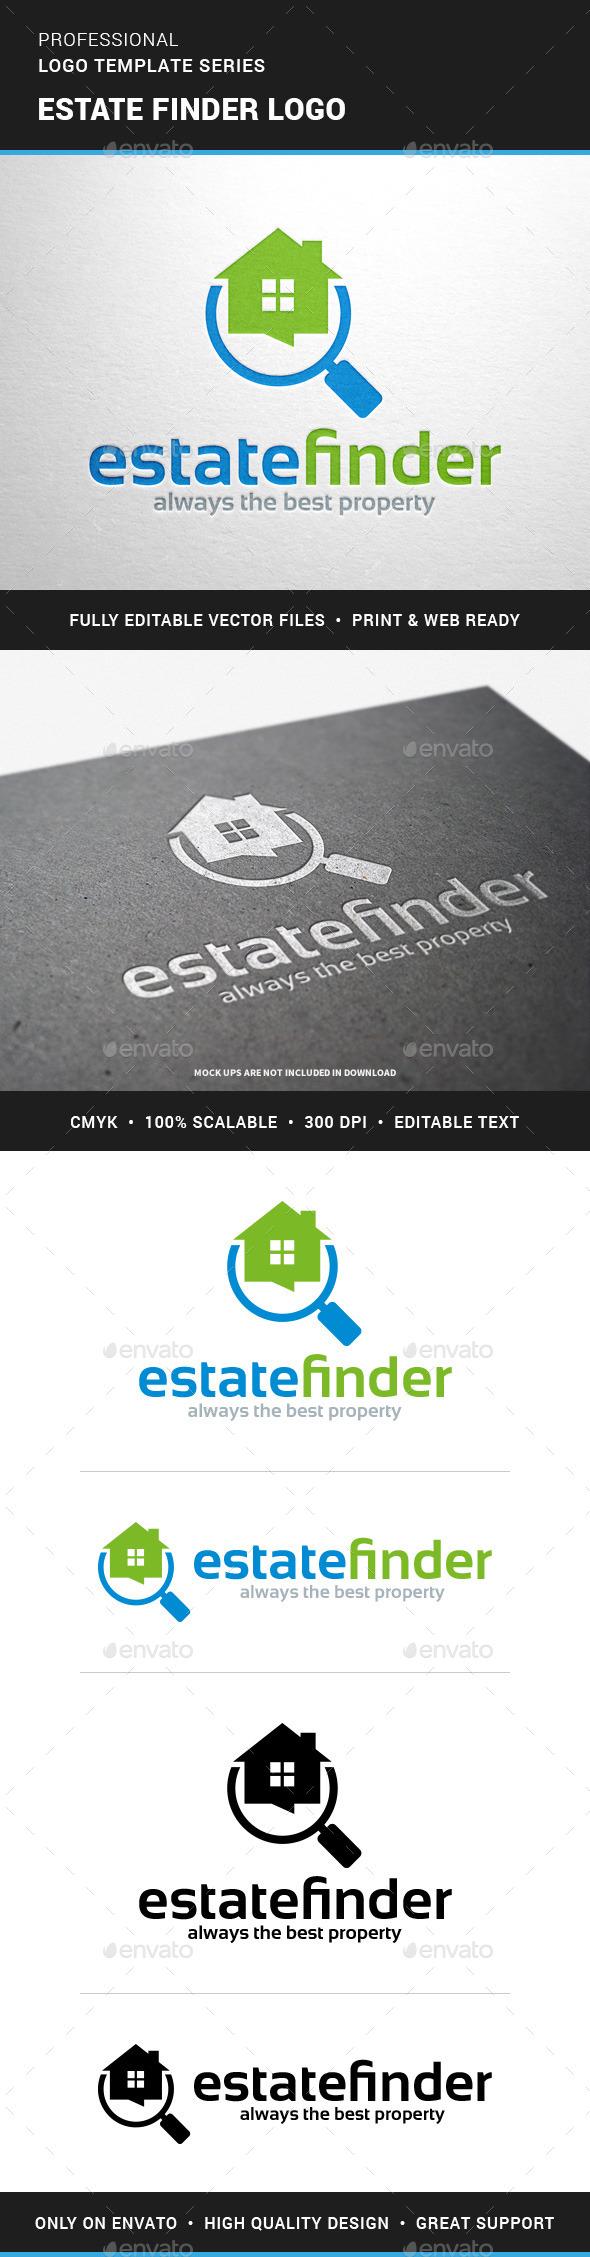 Estate Finder Logo Template - Buildings Logo Templates